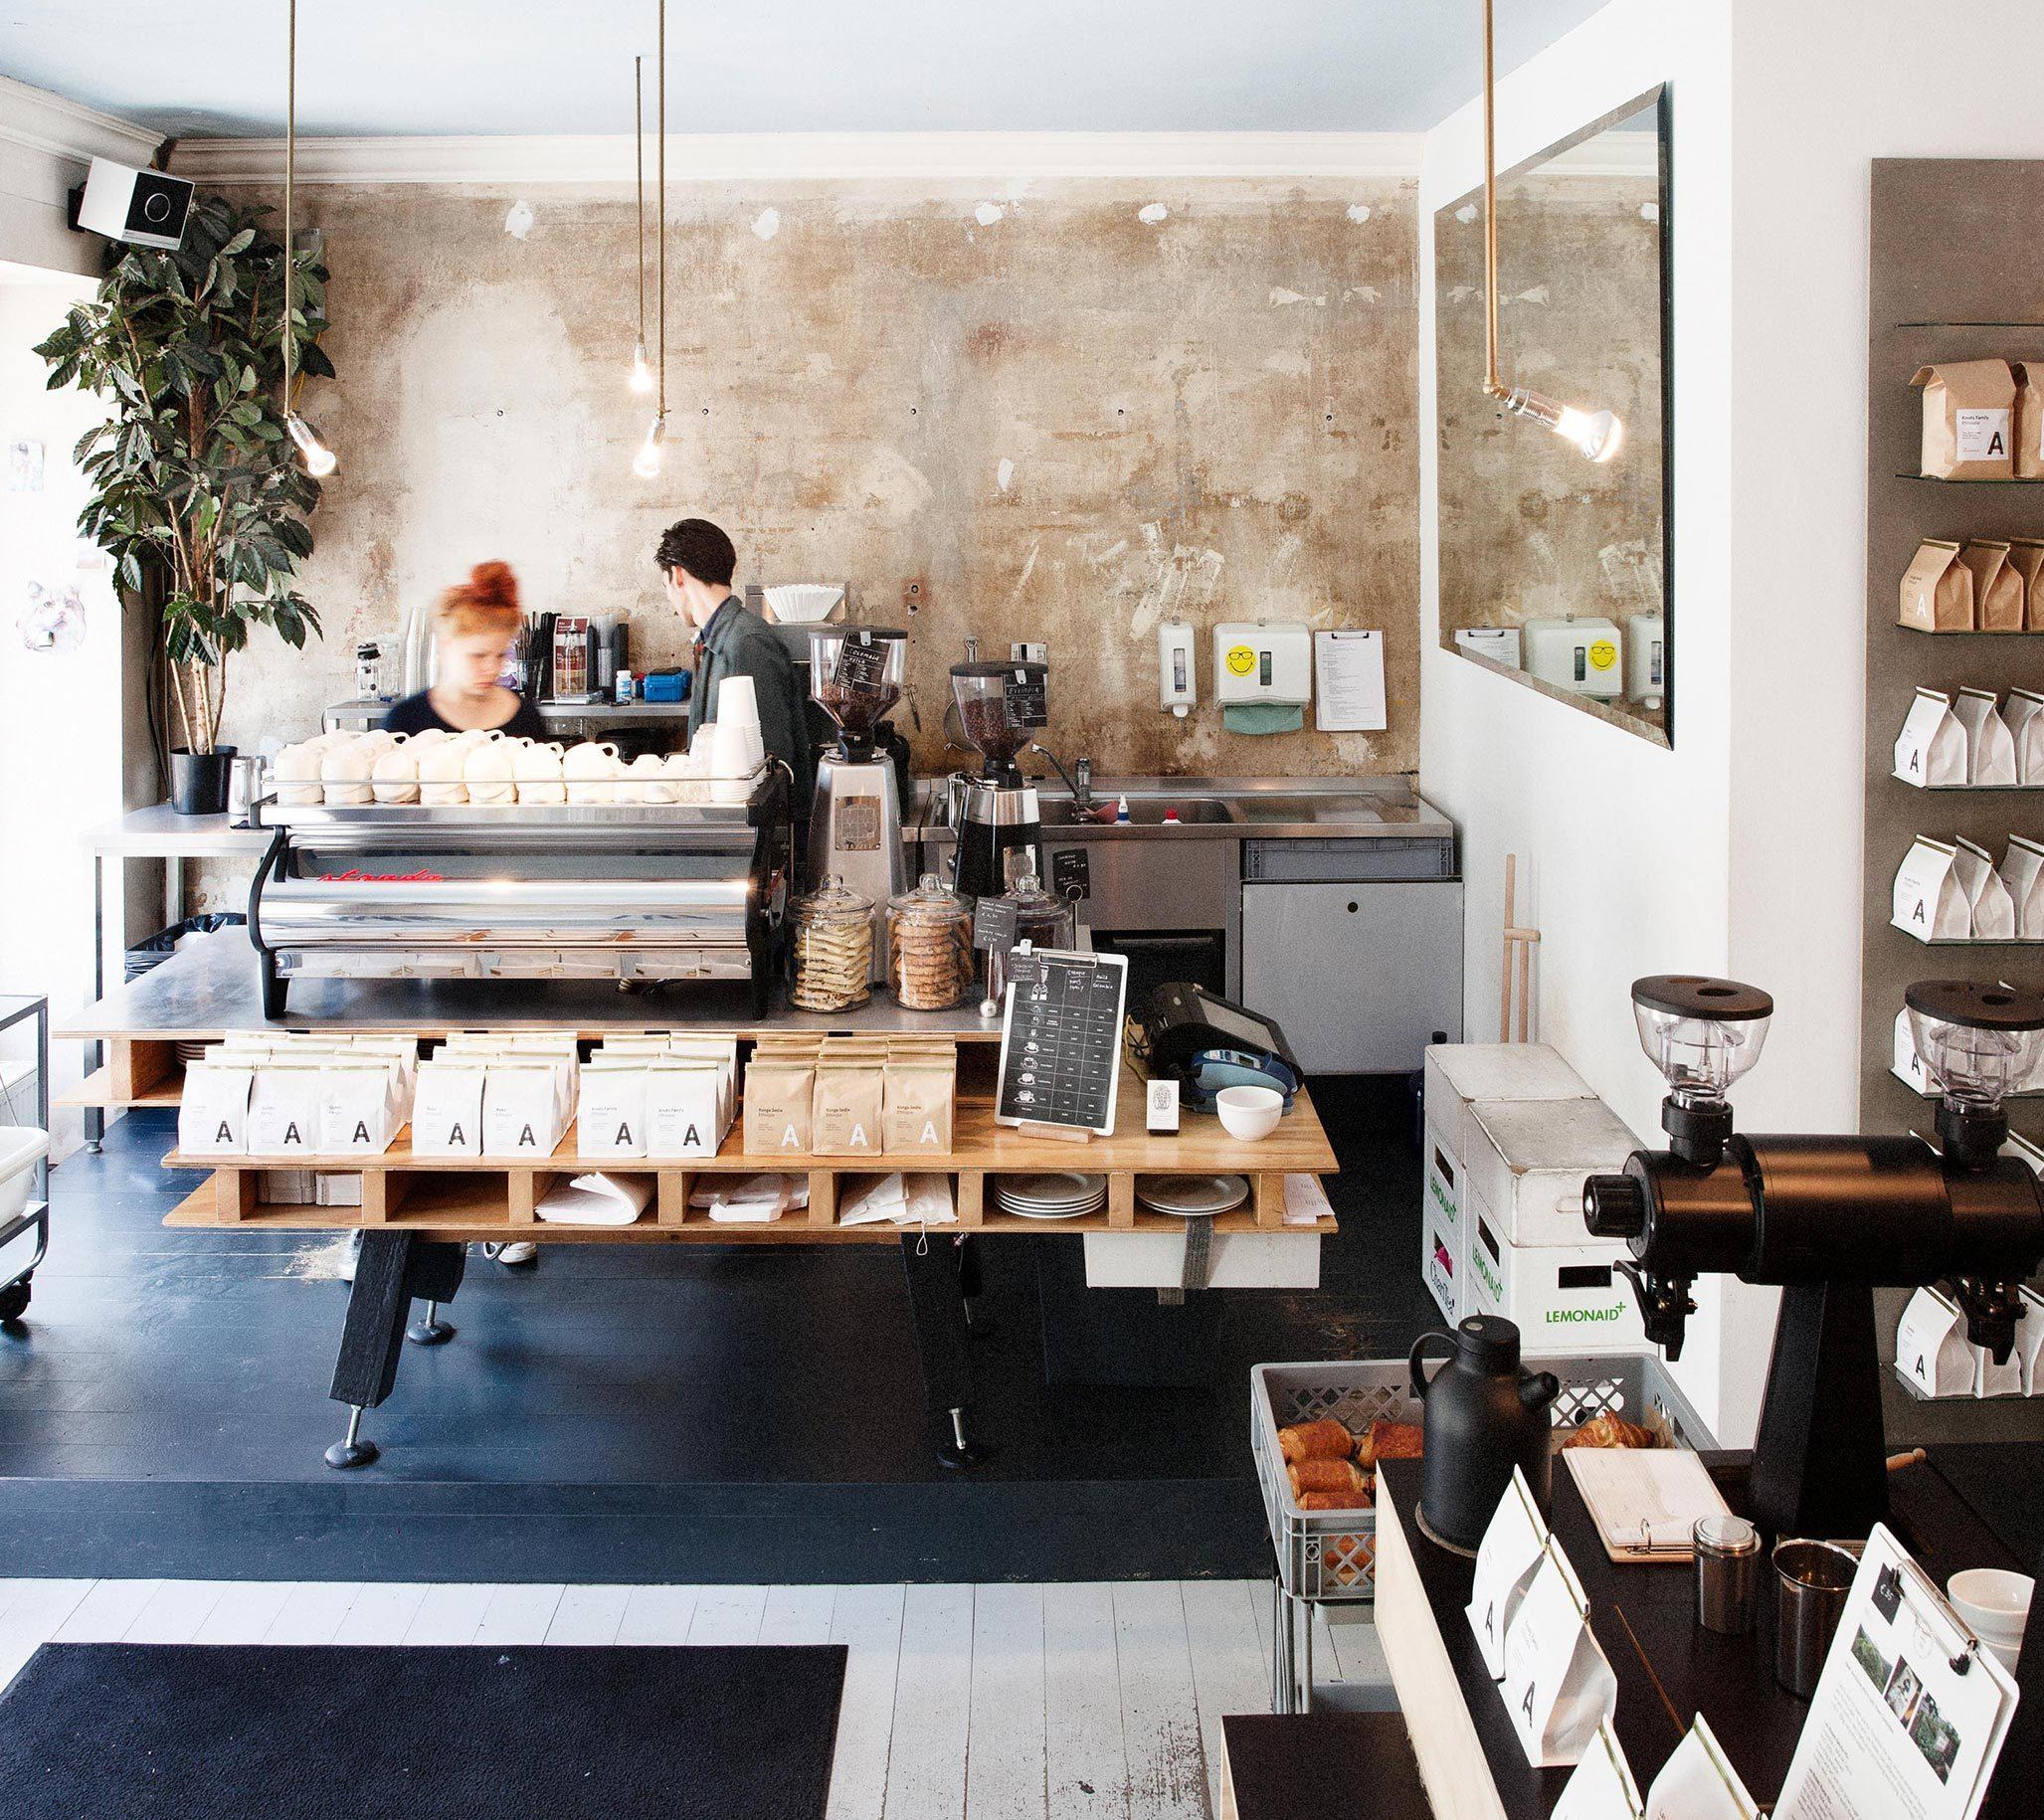 Café at Oderberger